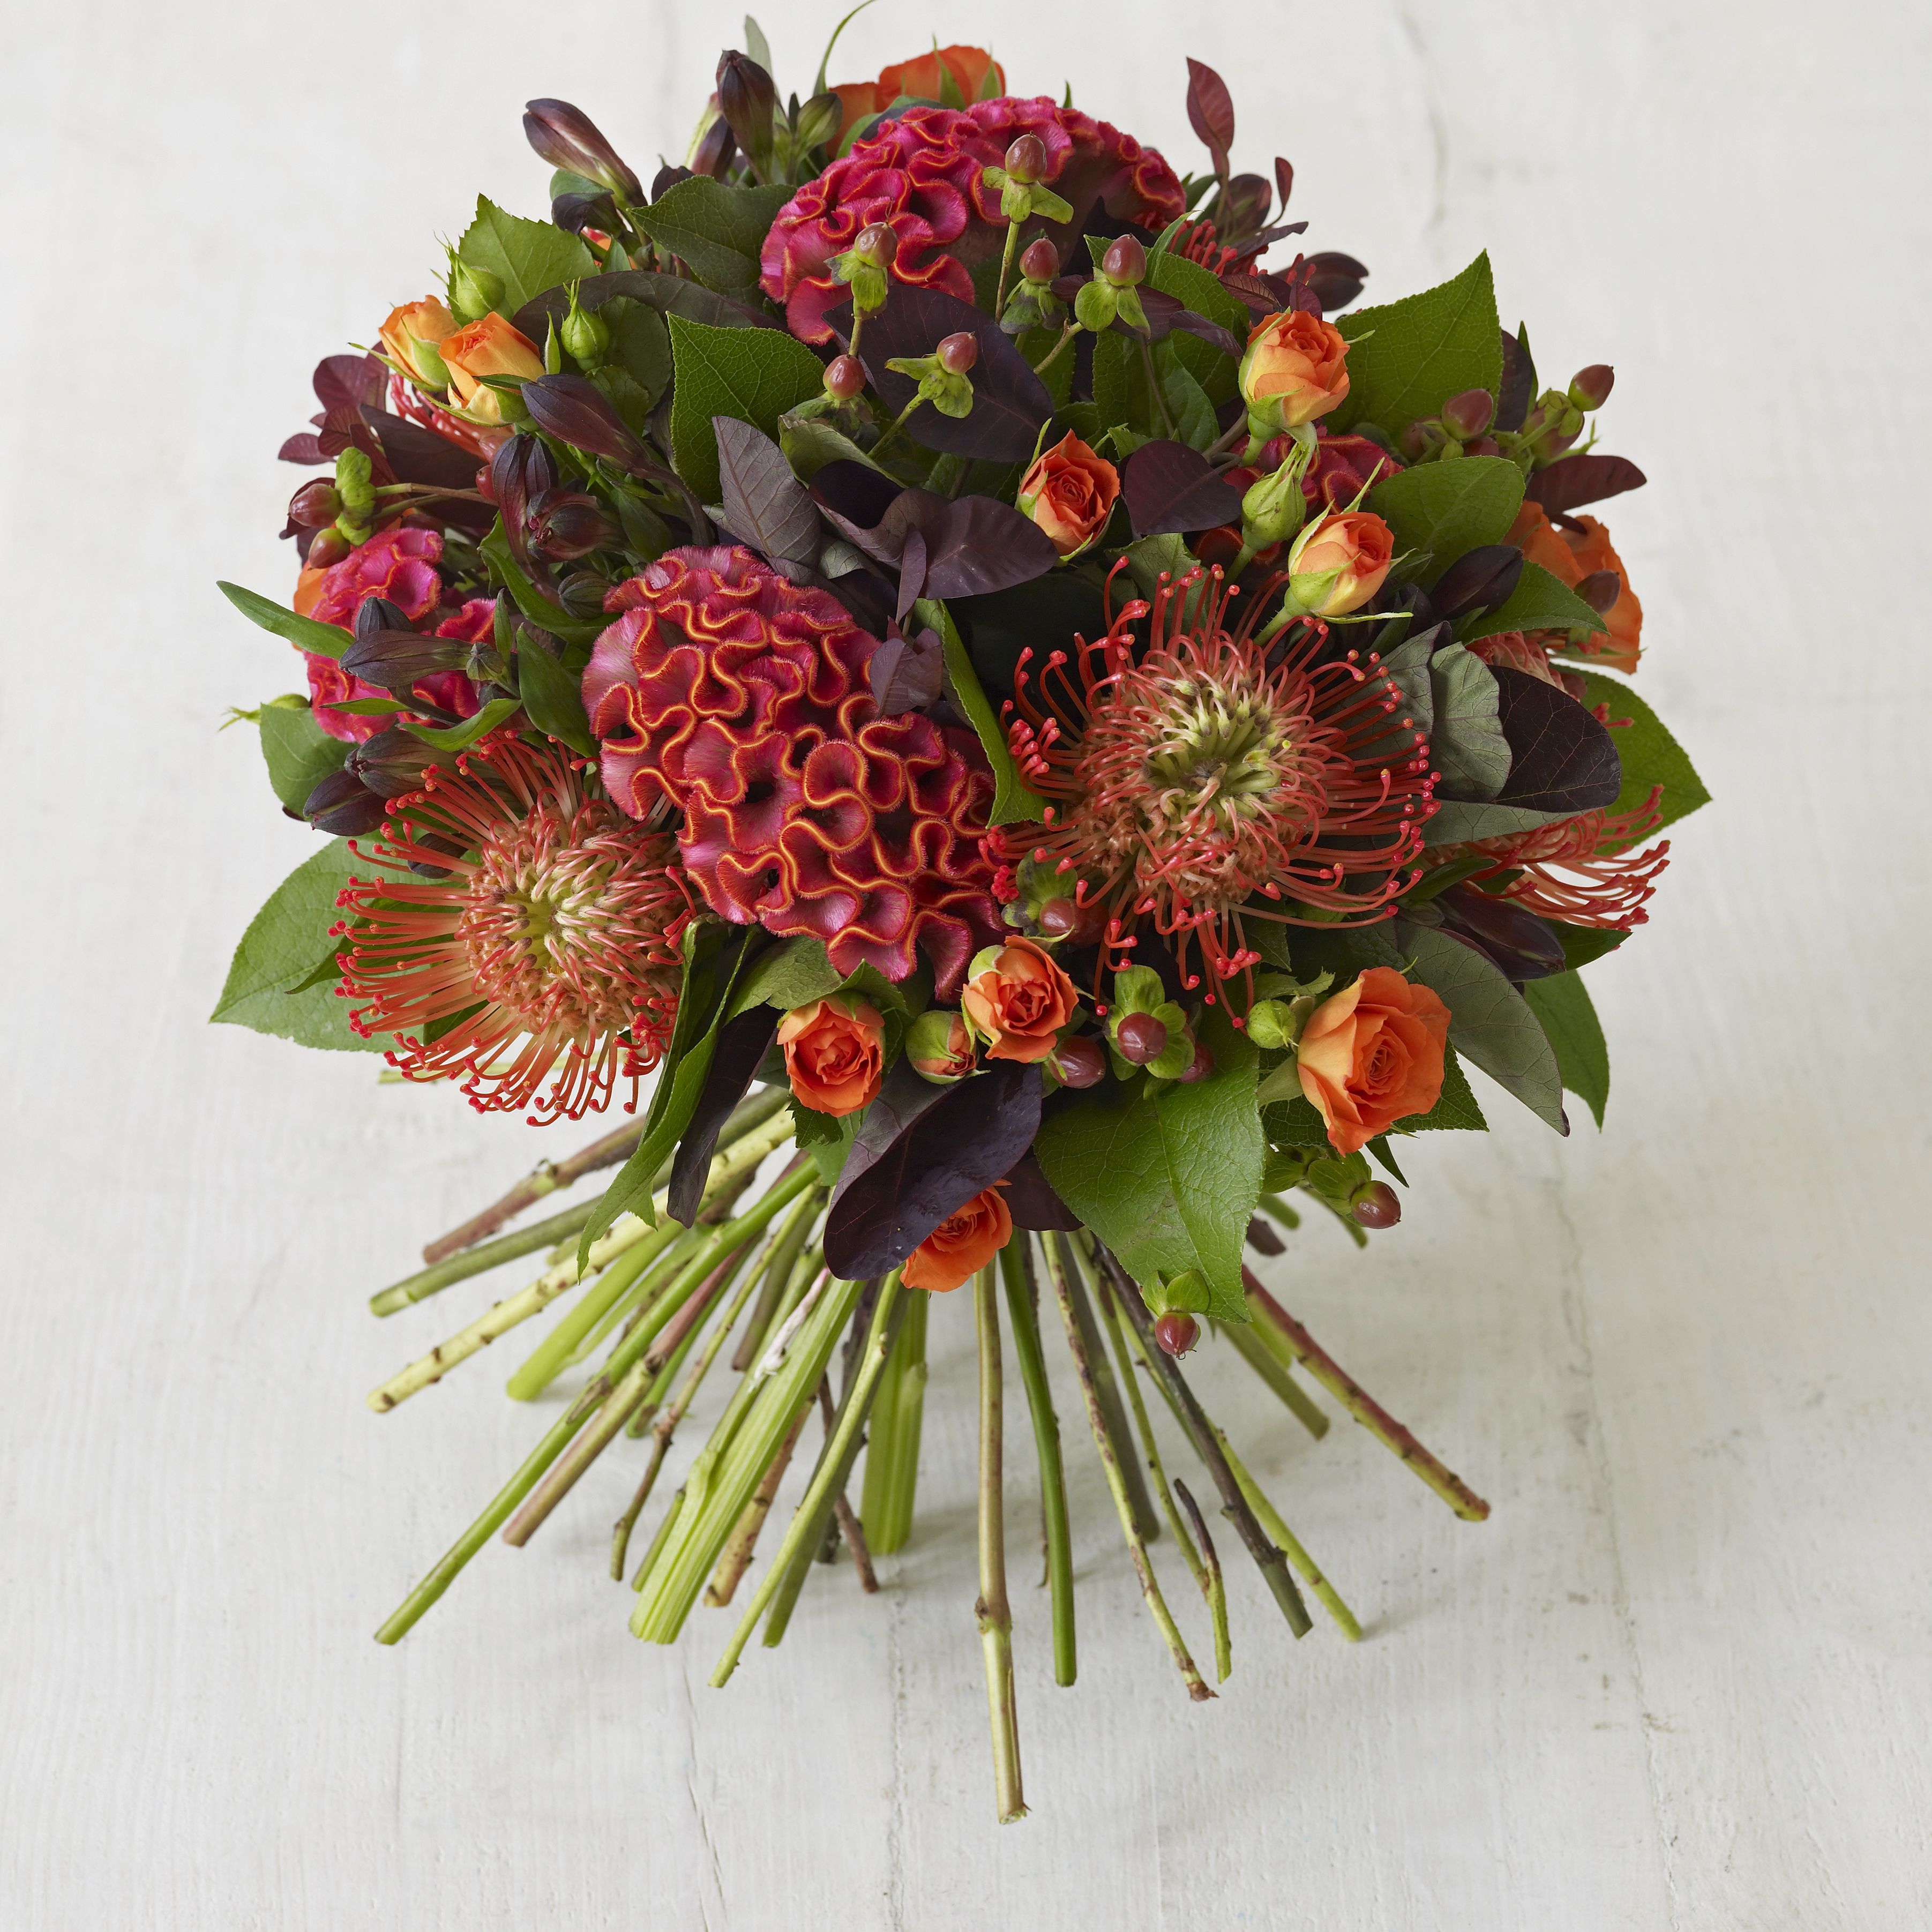 Image of: Fall Wedding Flower Gallery